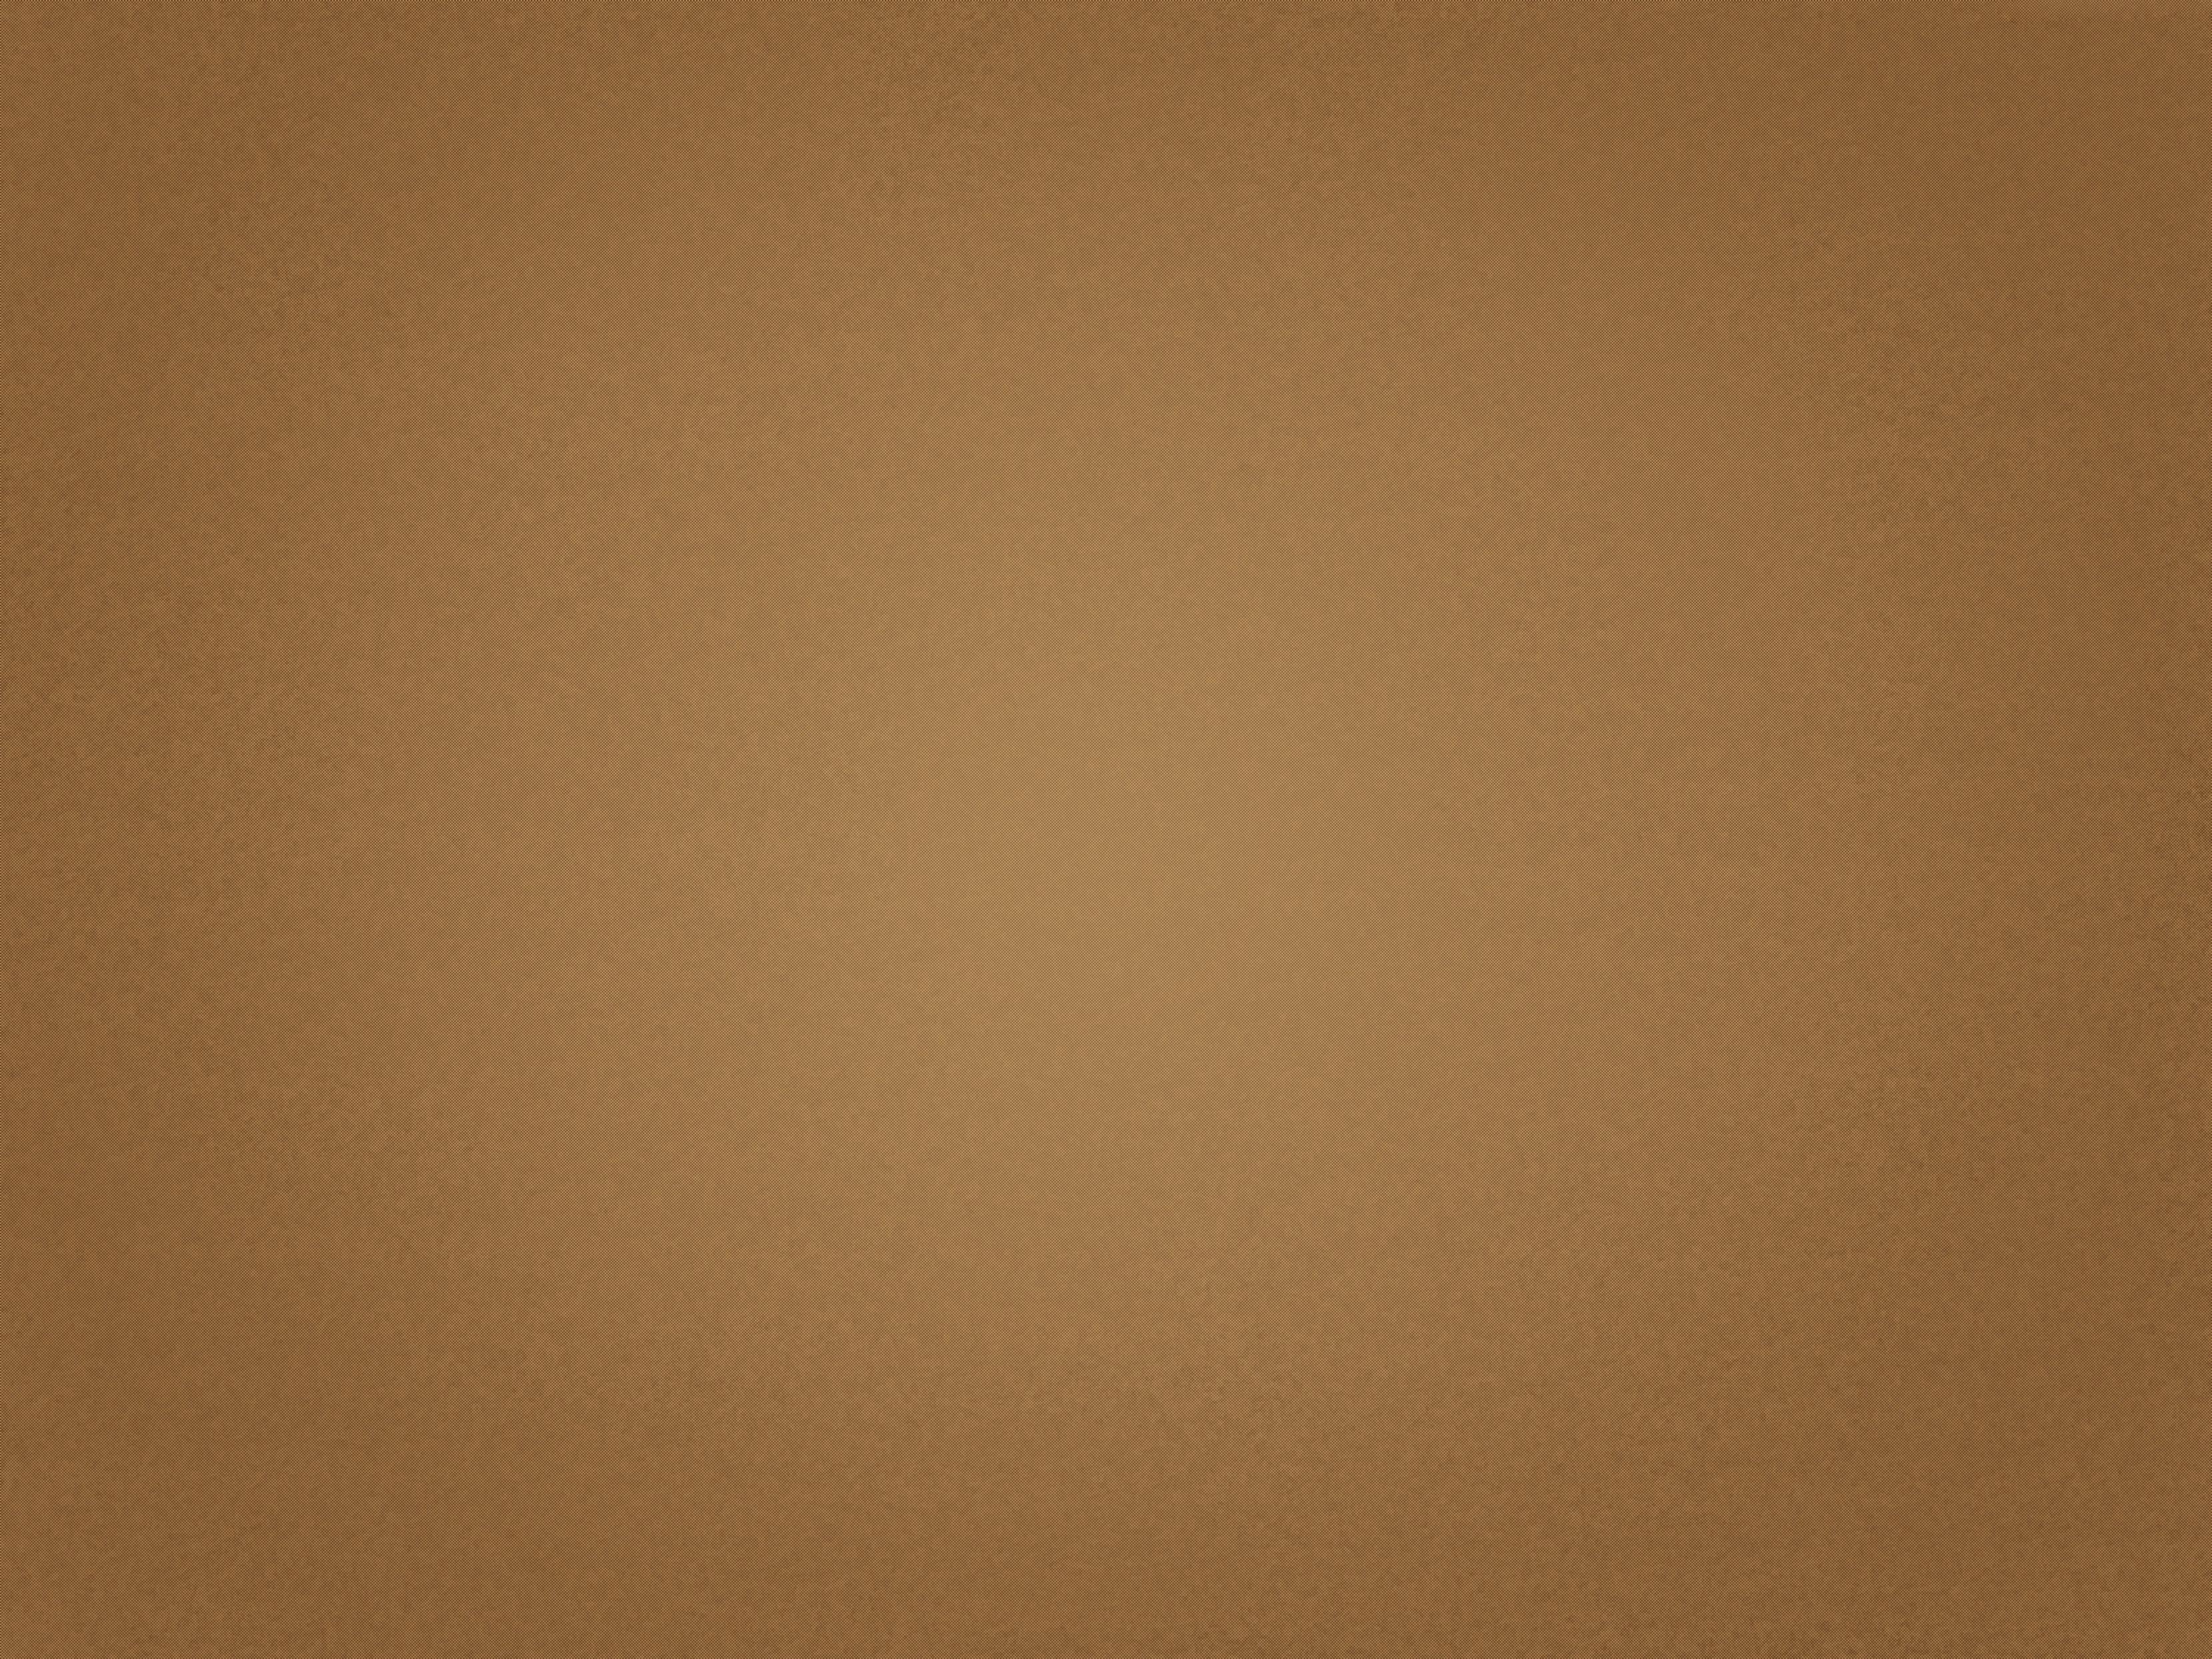 texture Brown paper download texture background paper texture 3317x2488